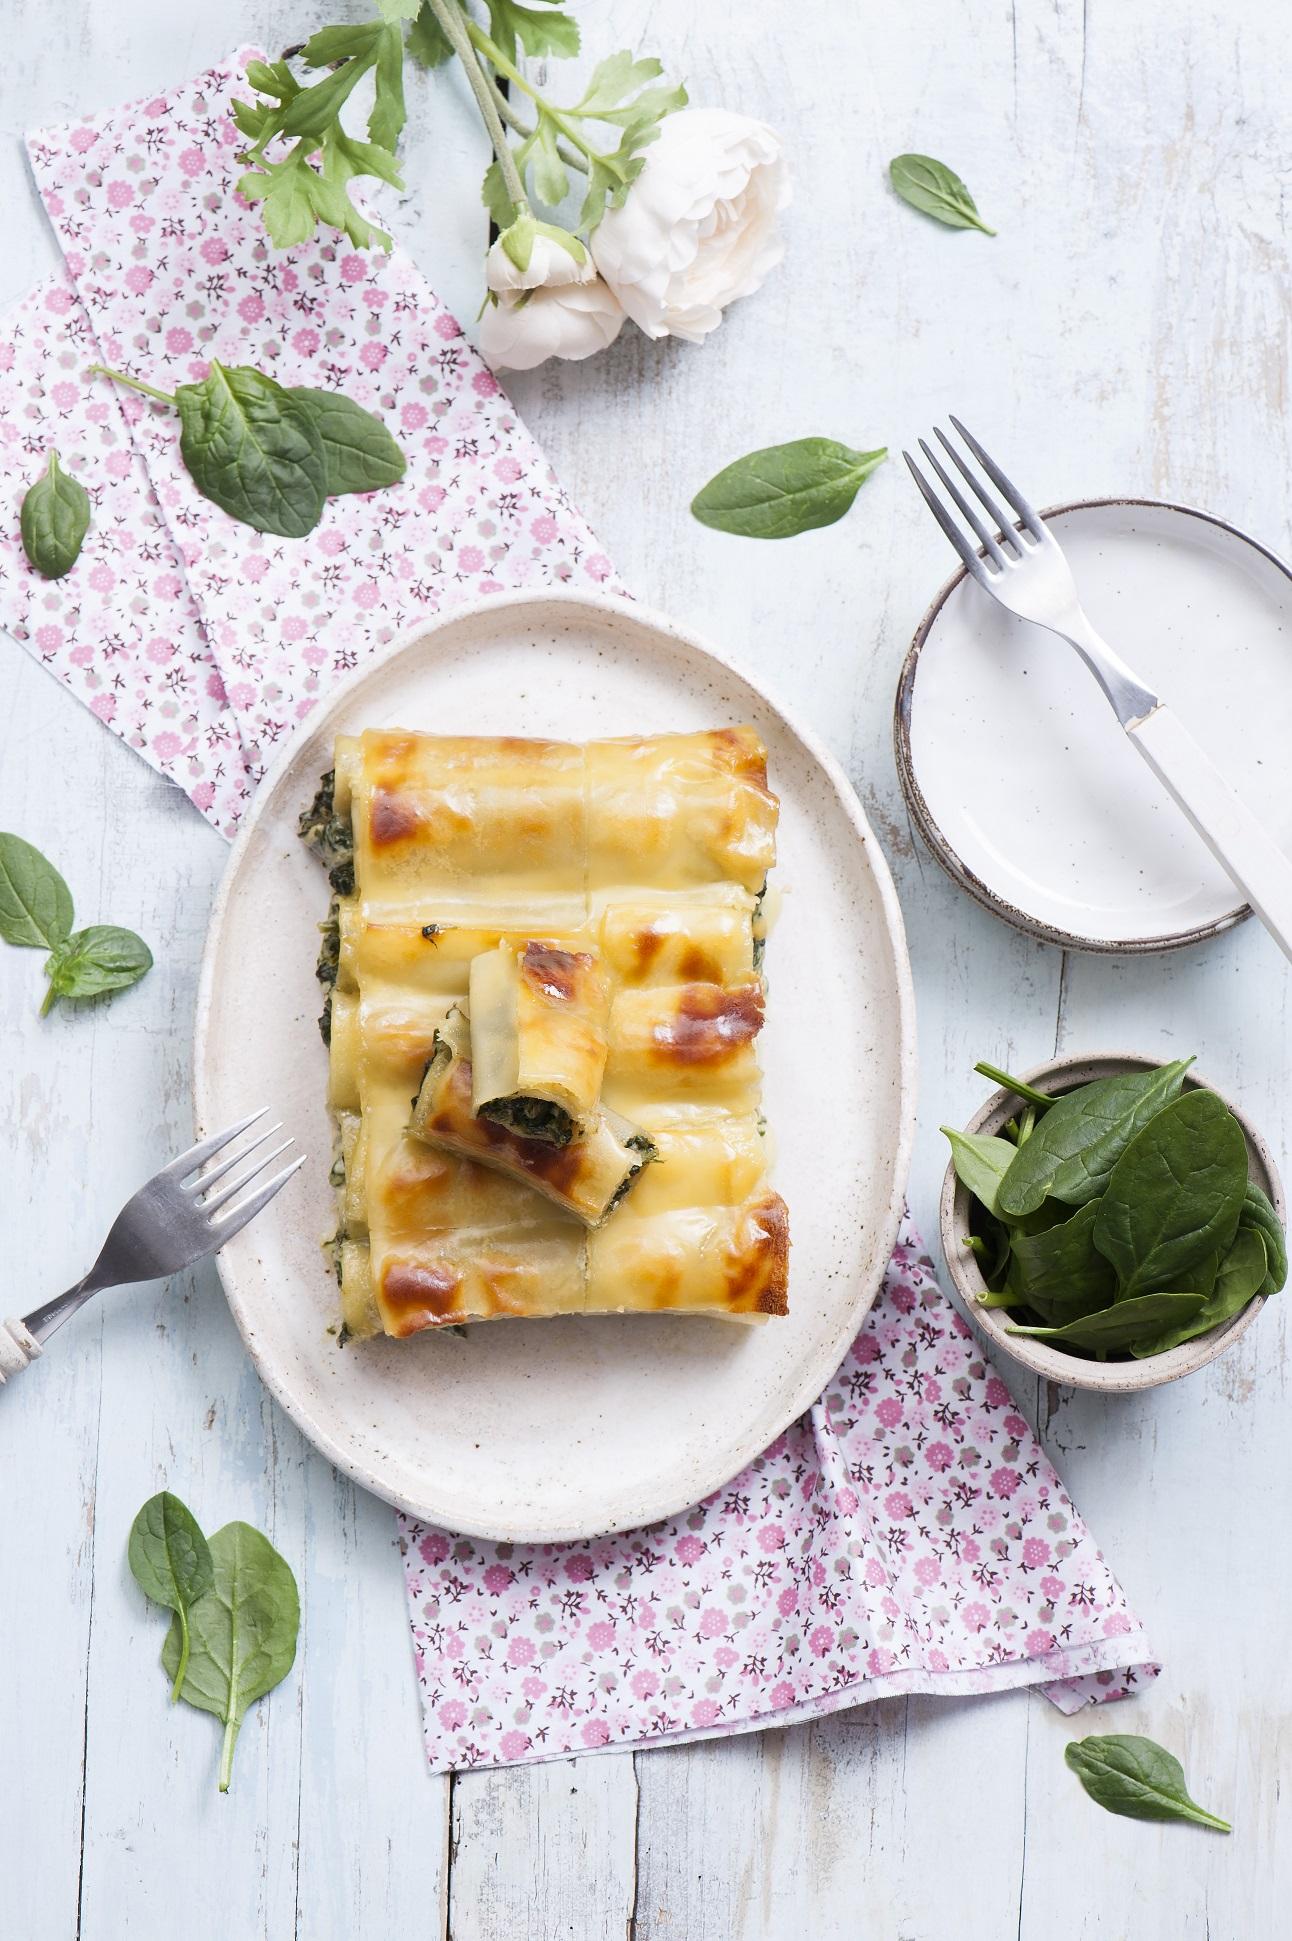 Cannelloni ze szpinakiem i kremowym serem